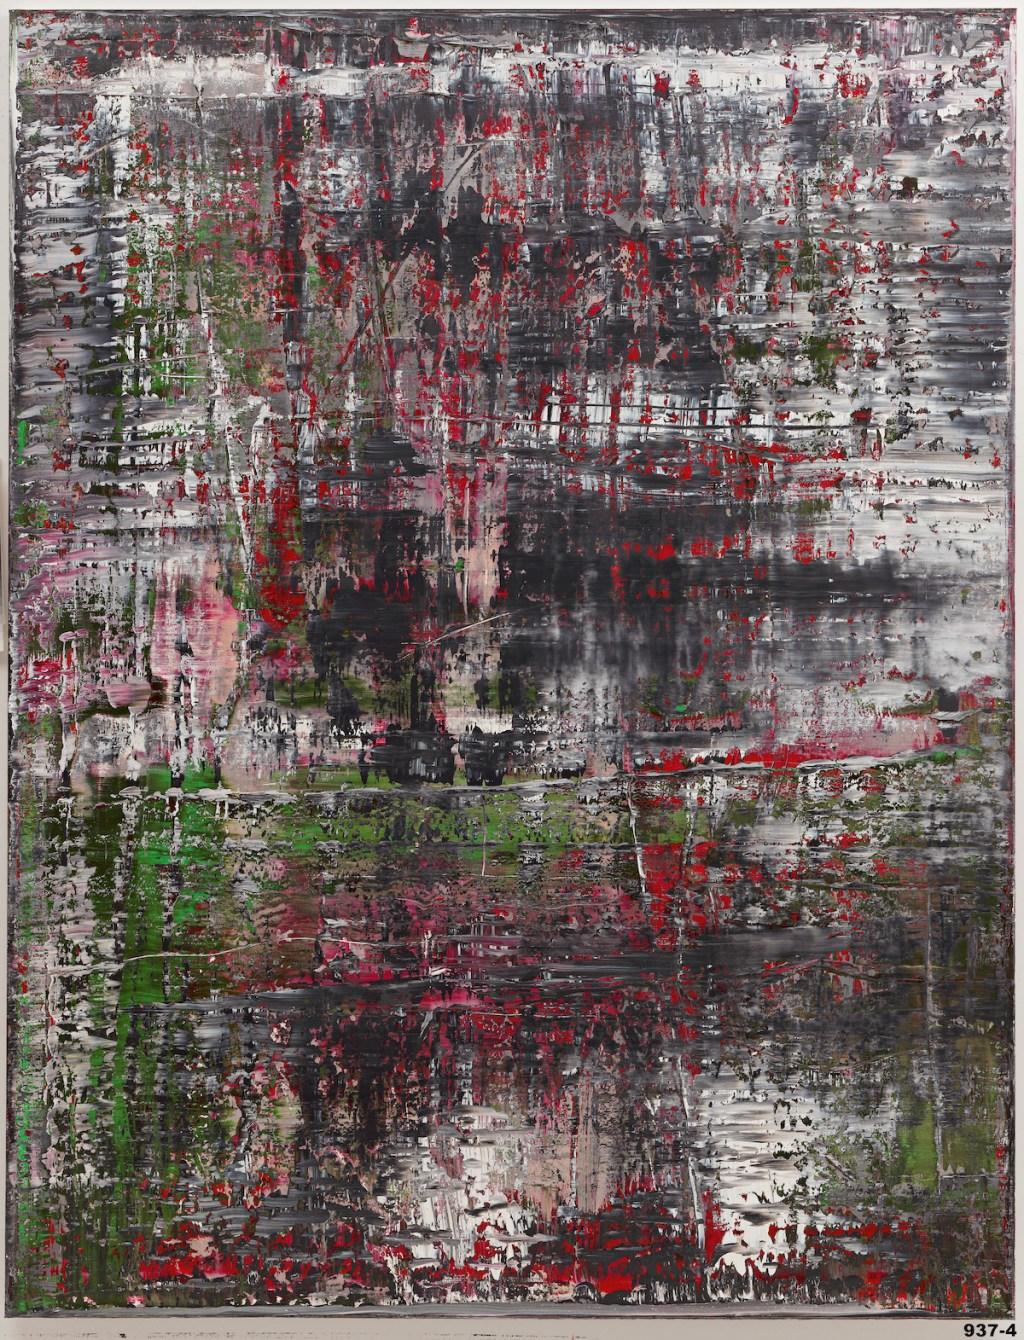 Gerhard Richter Permanently Loans 100 Works to Berlin Museum